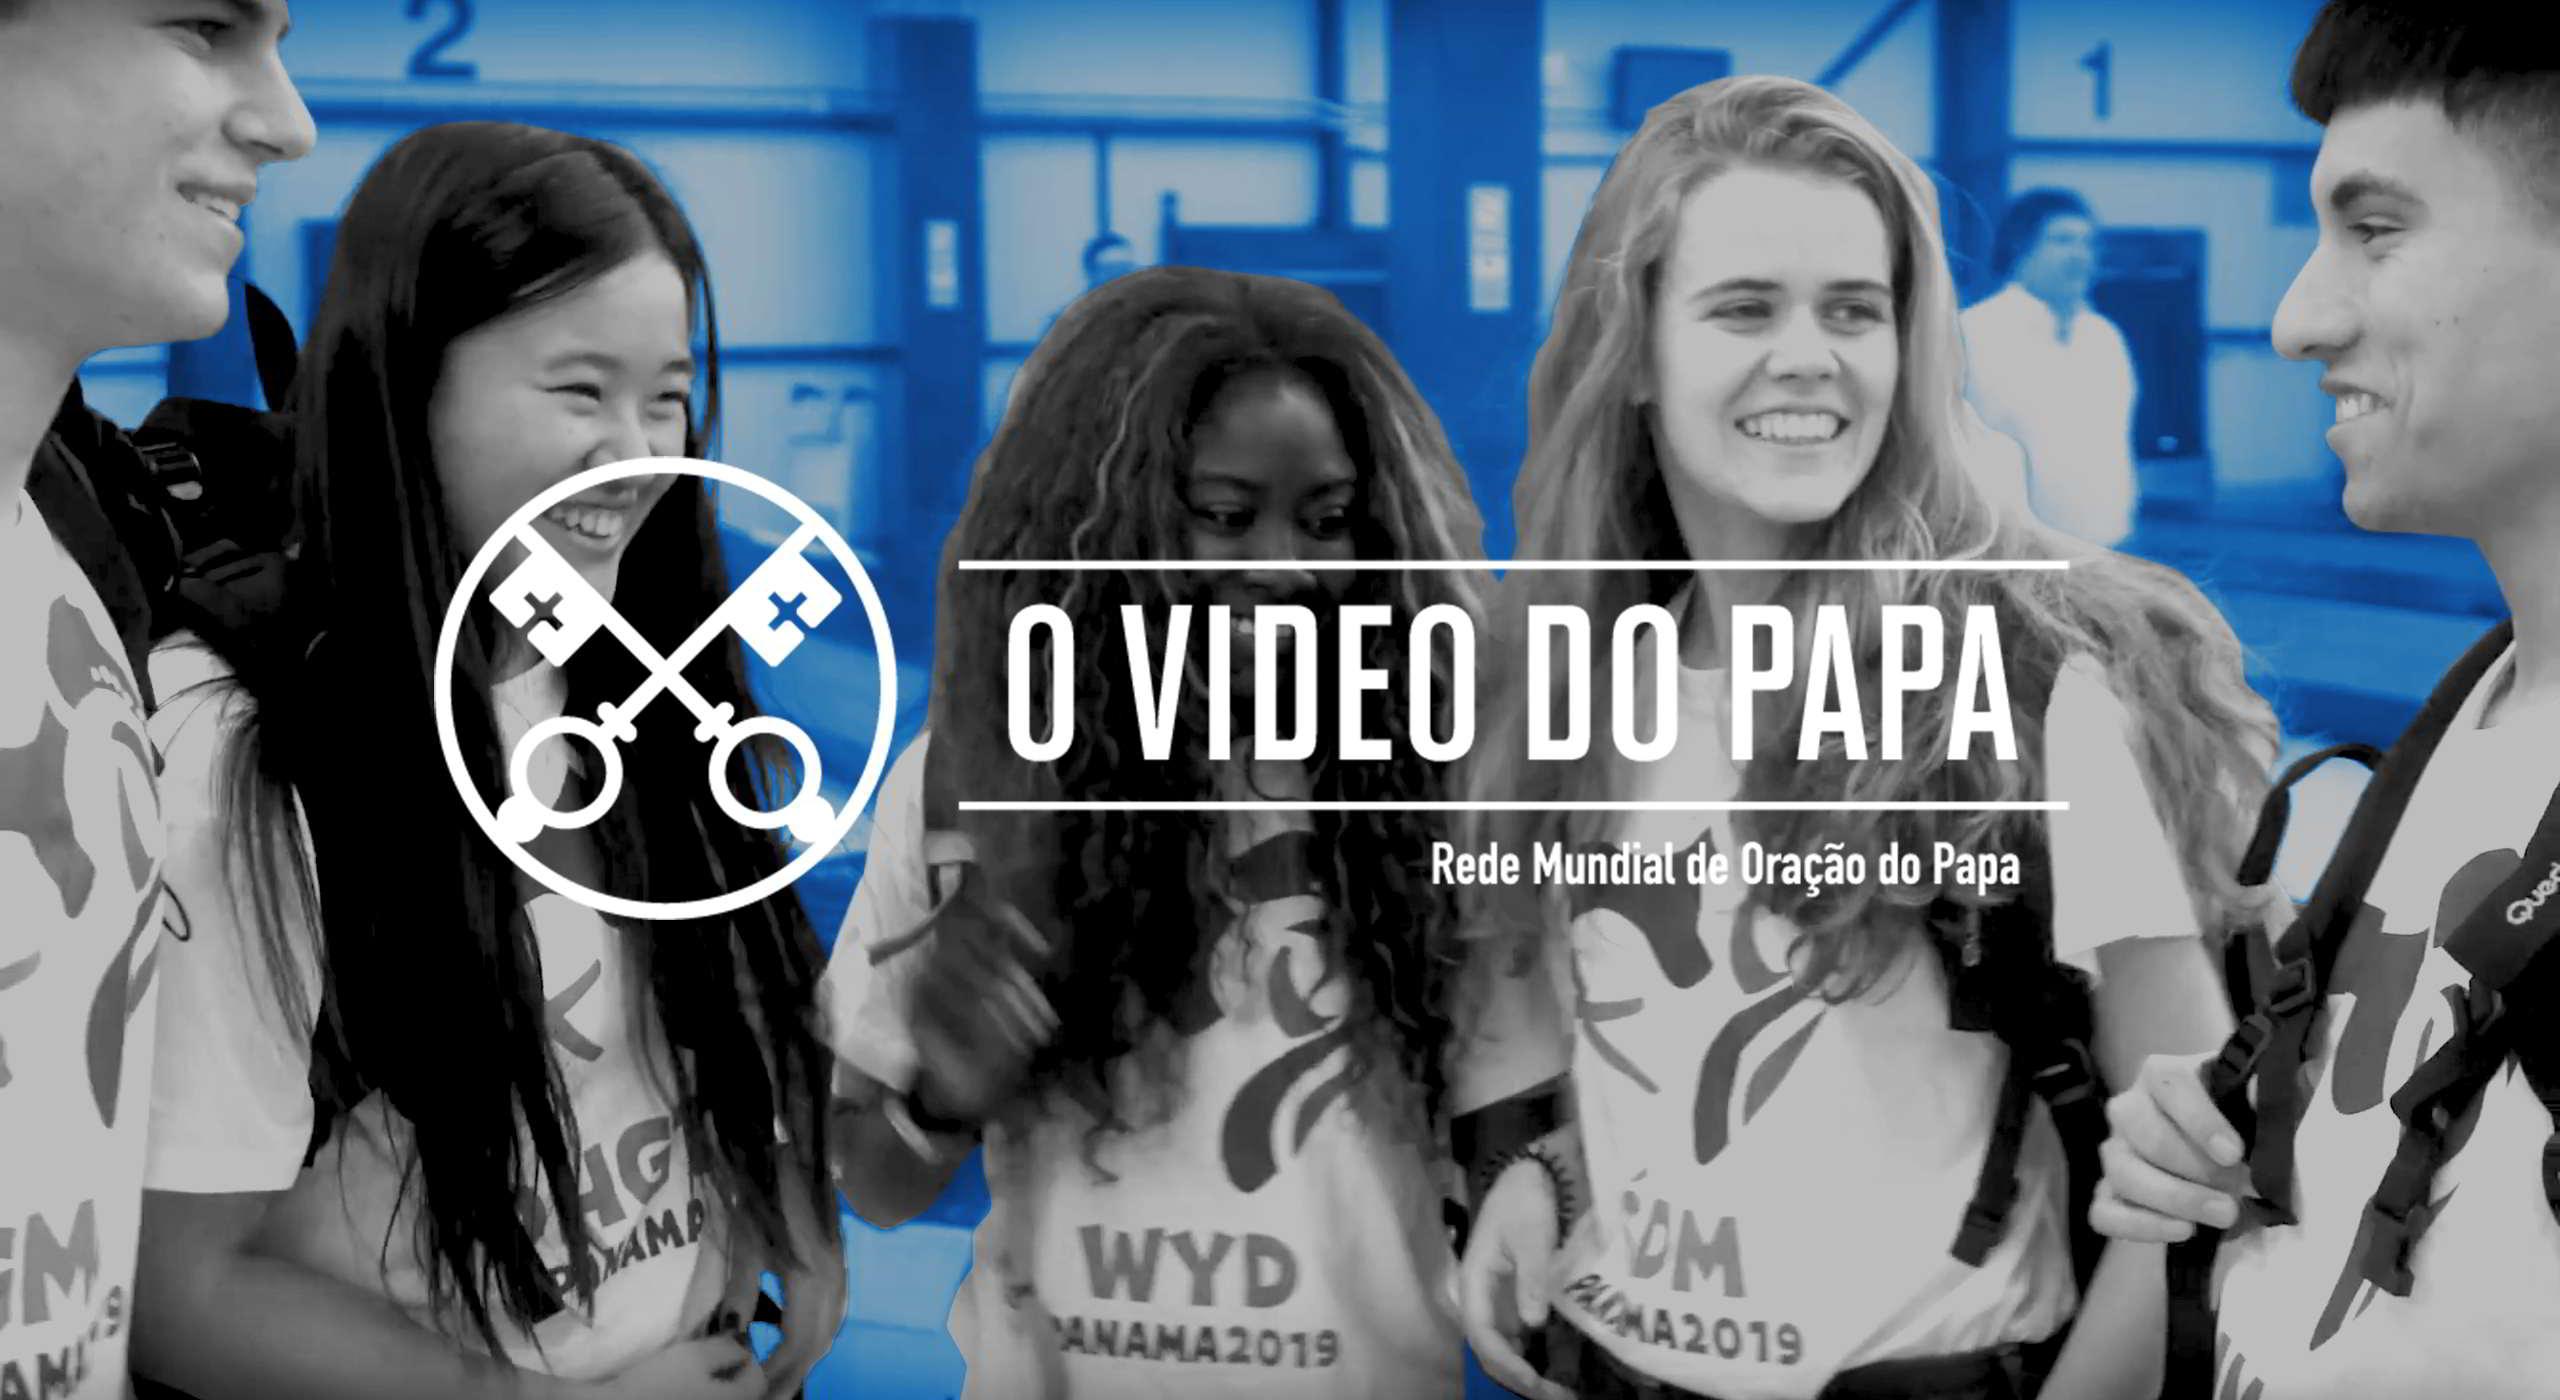 Official Image - TPV 1 2019 - 4 PT - O Video do Papa - Jovens na escola de Maria